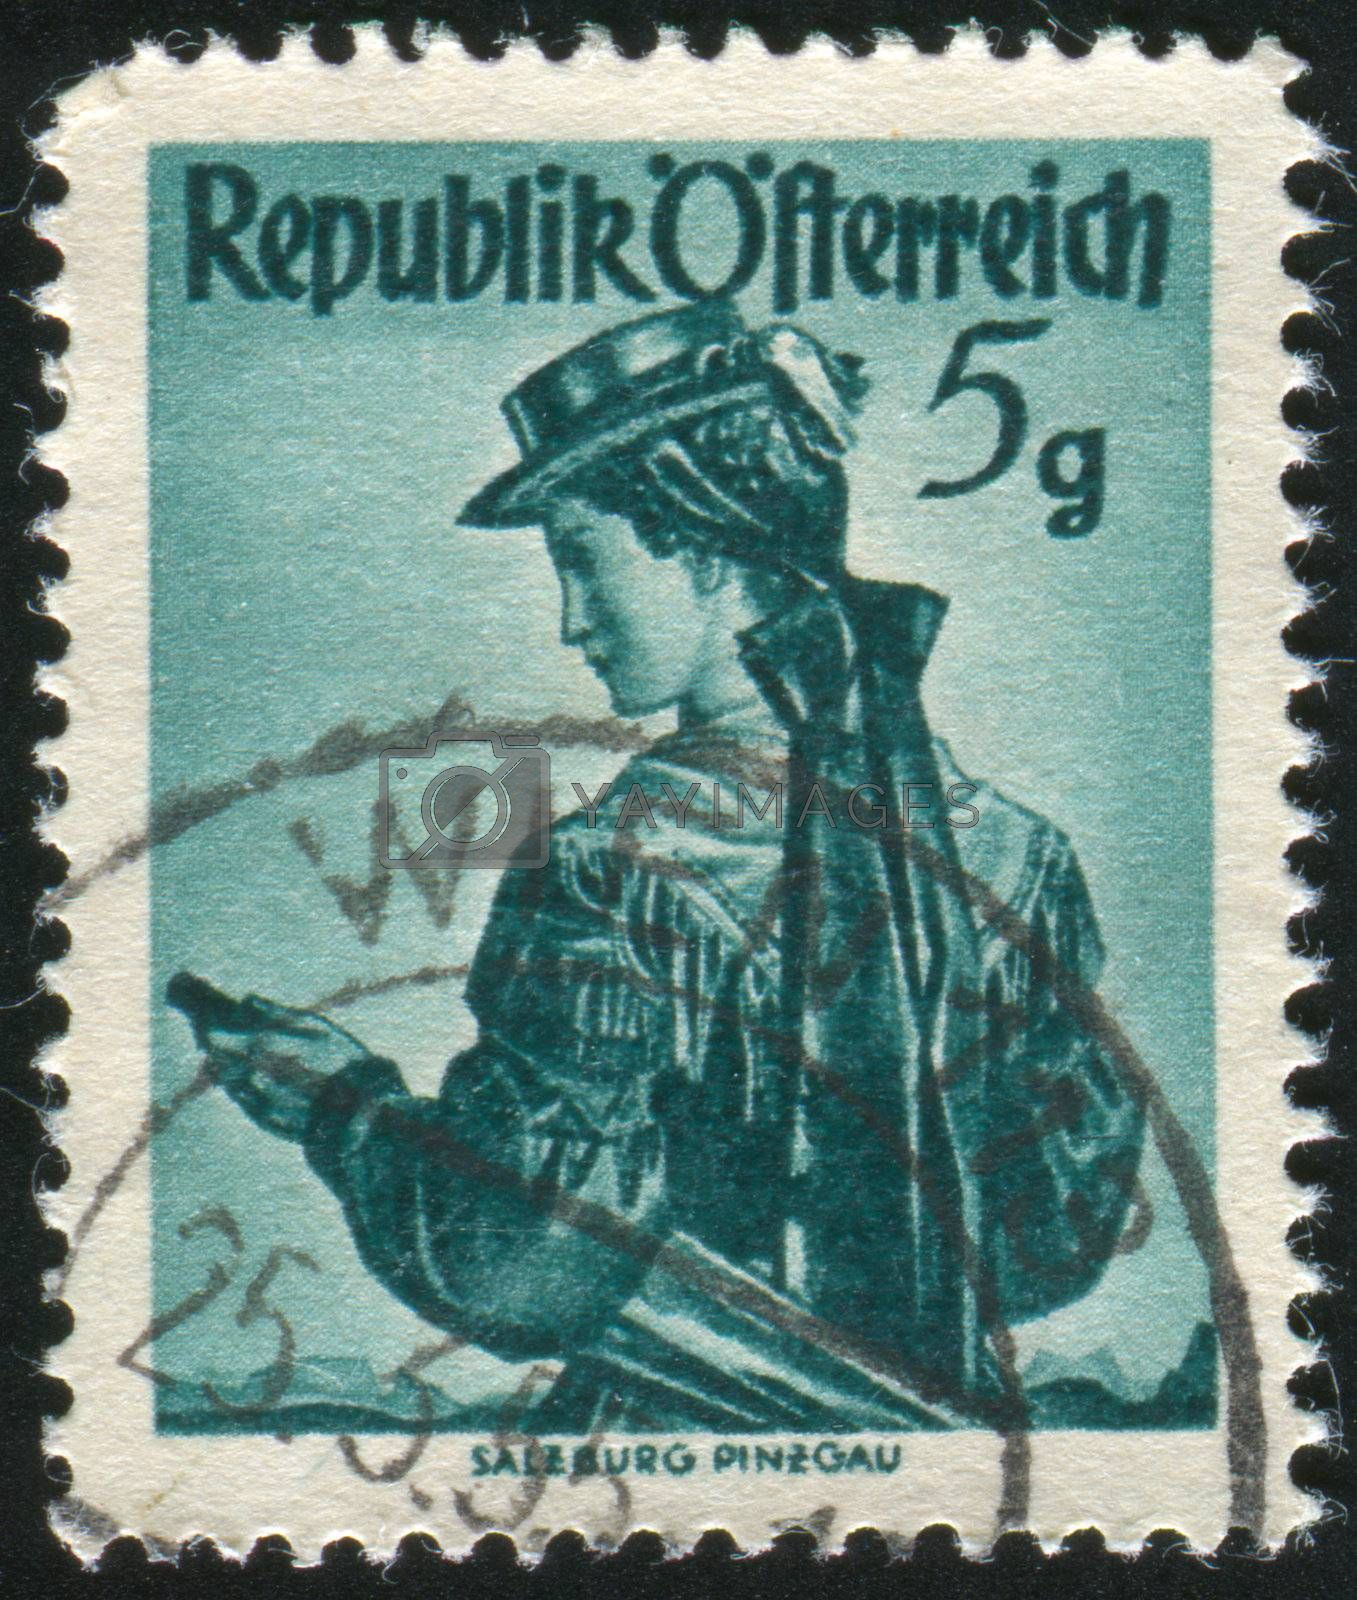 AUSTRIA - CIRCA 1948: stamp printed by Austria, shows Austrian Costumes, Salzburg, Pinzgau, circa 1948